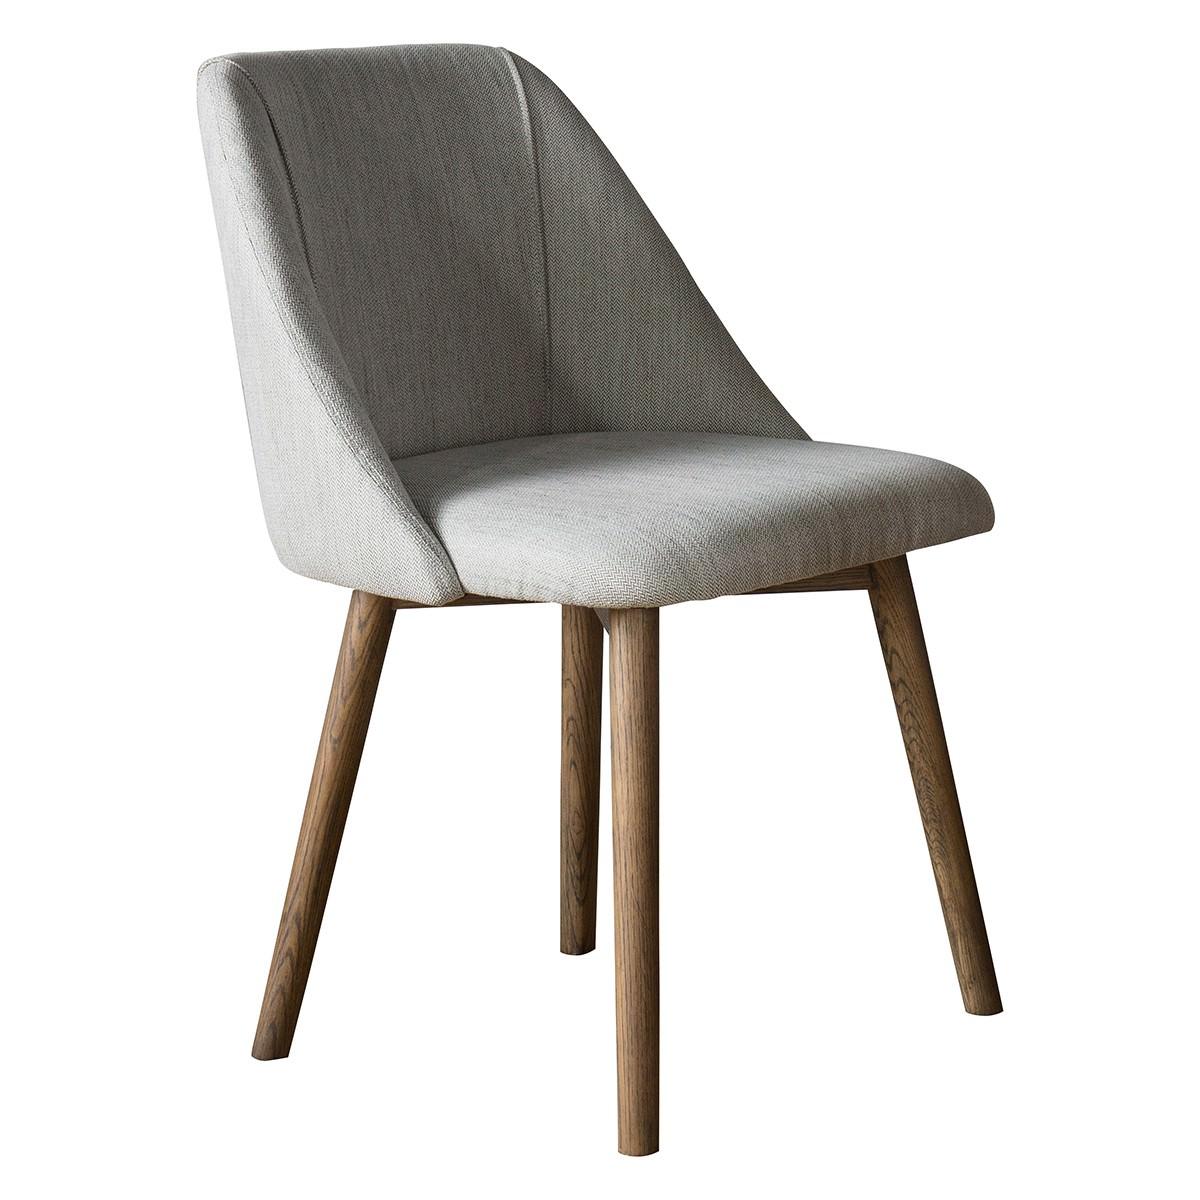 Emilia Fabric Dining Chair, Oatmeal